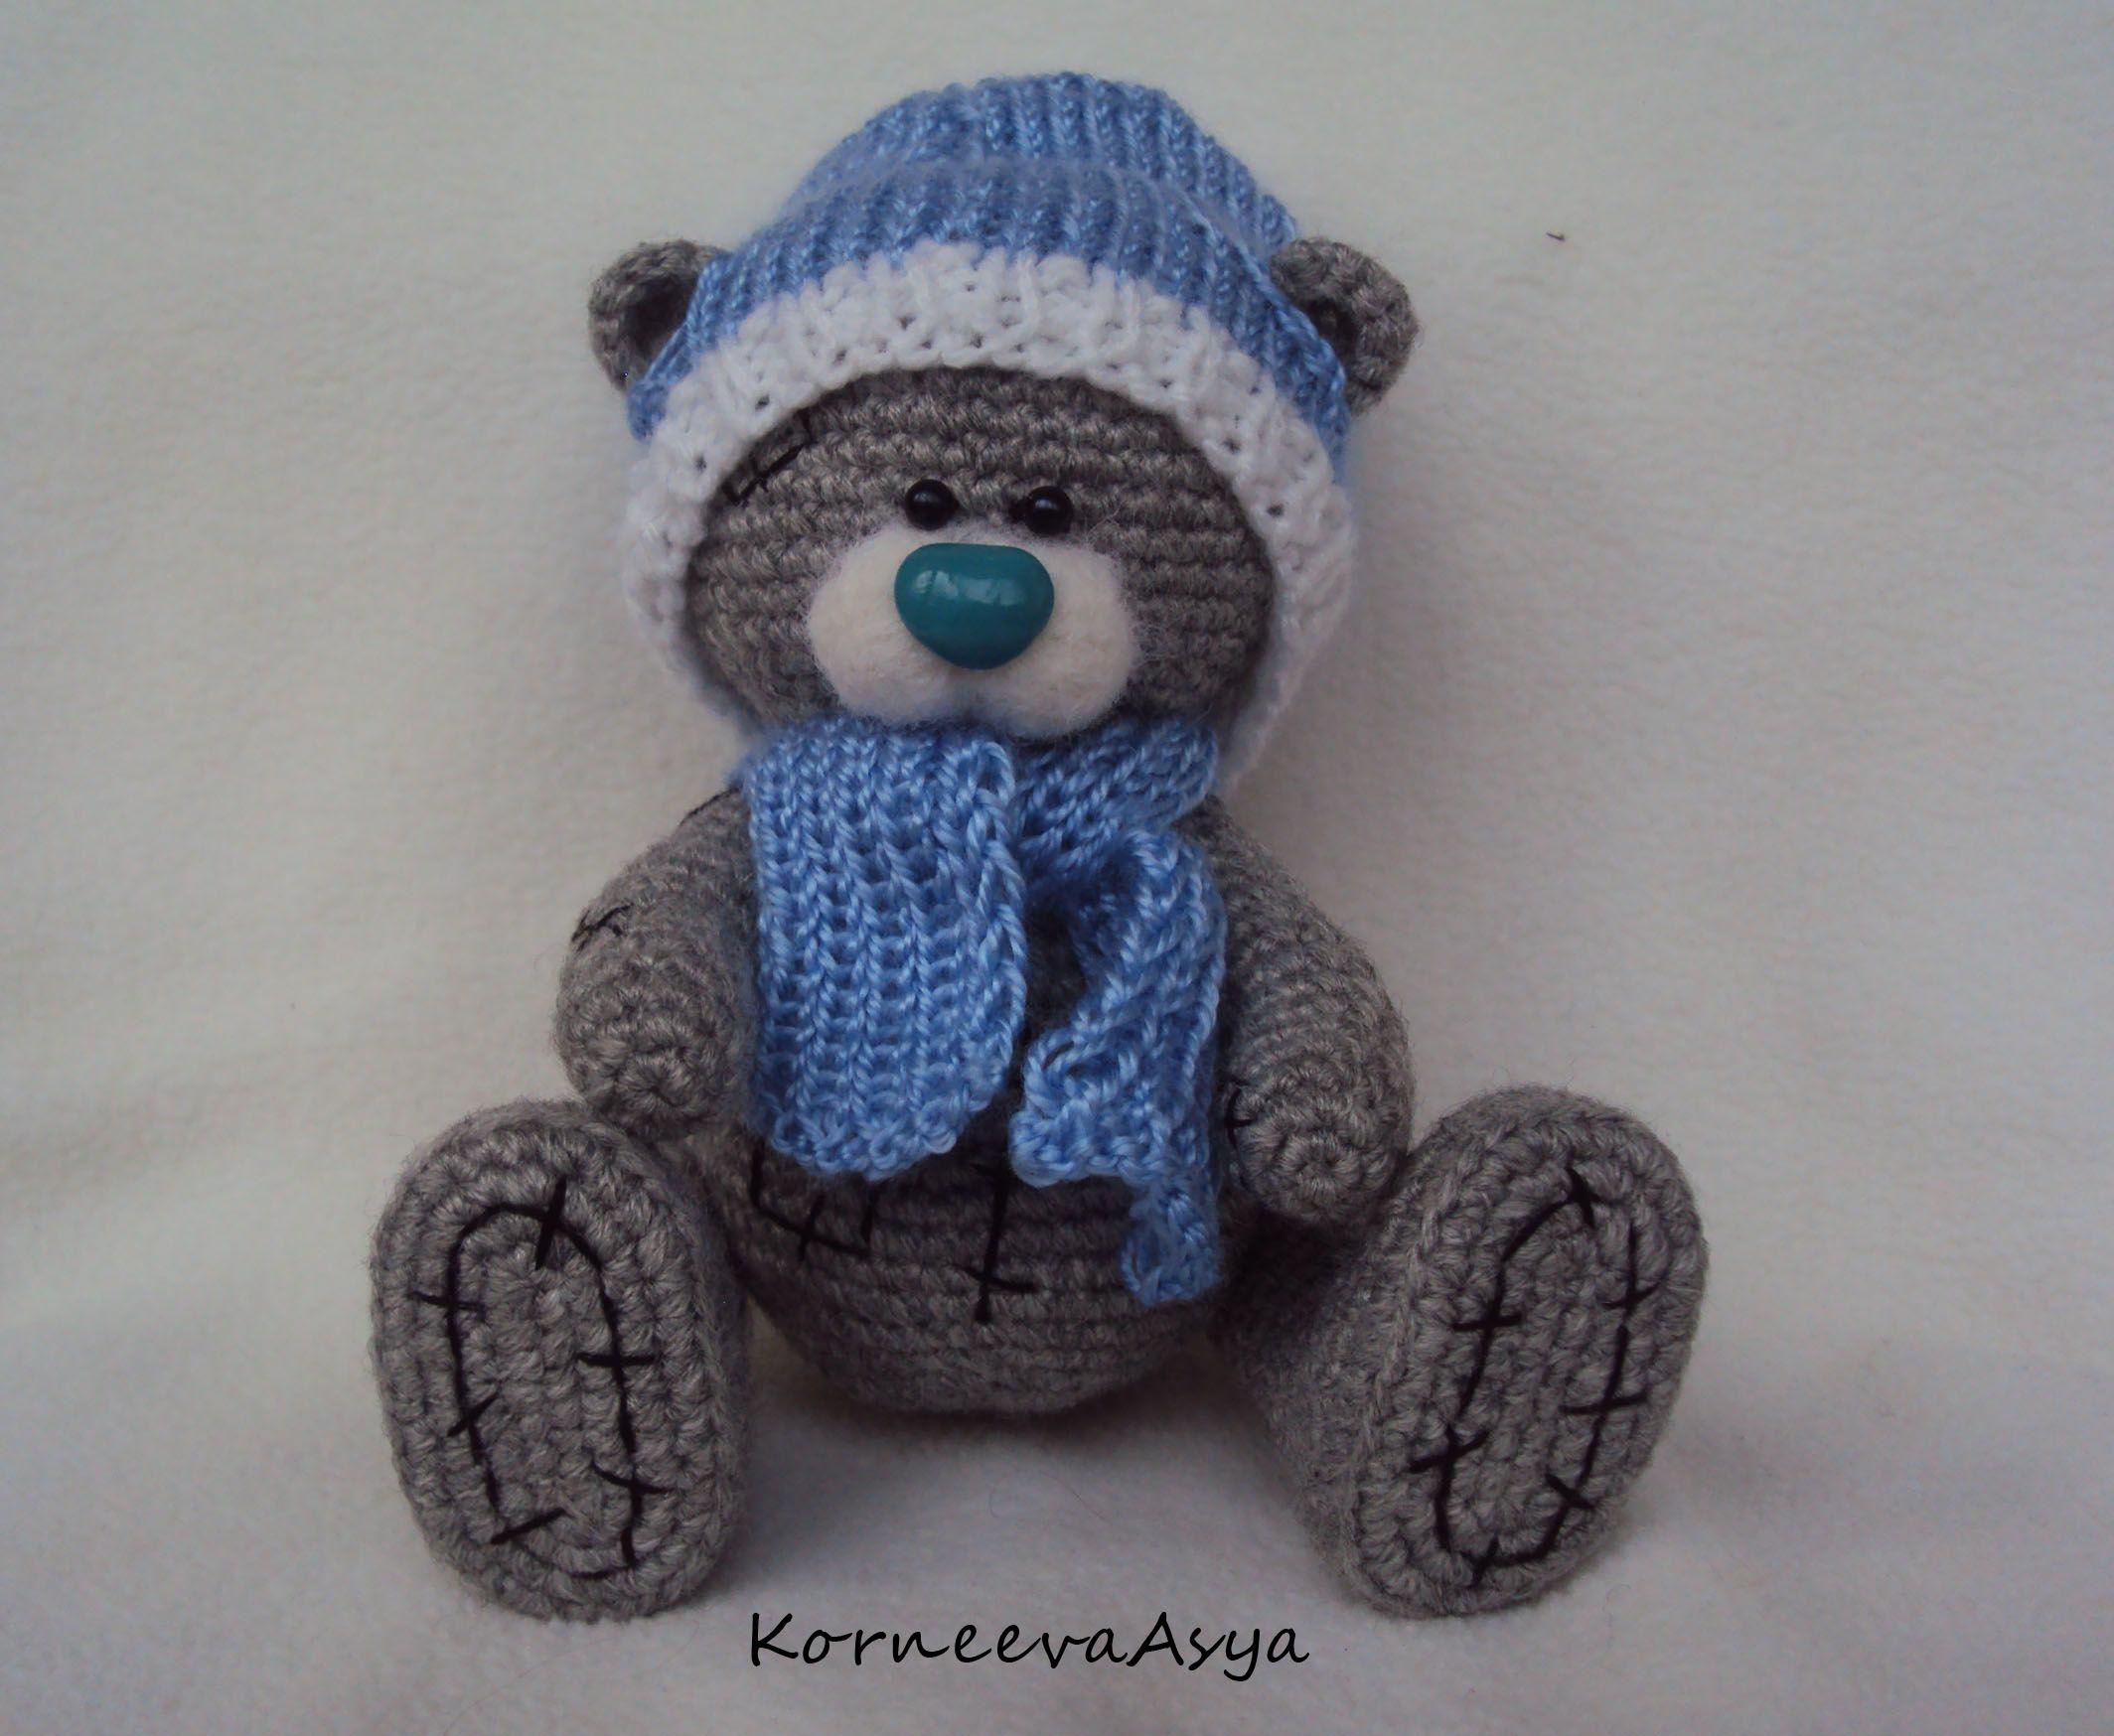 http://kliry.blogspot.ru/2012/10/blog-post.html - so cute ...